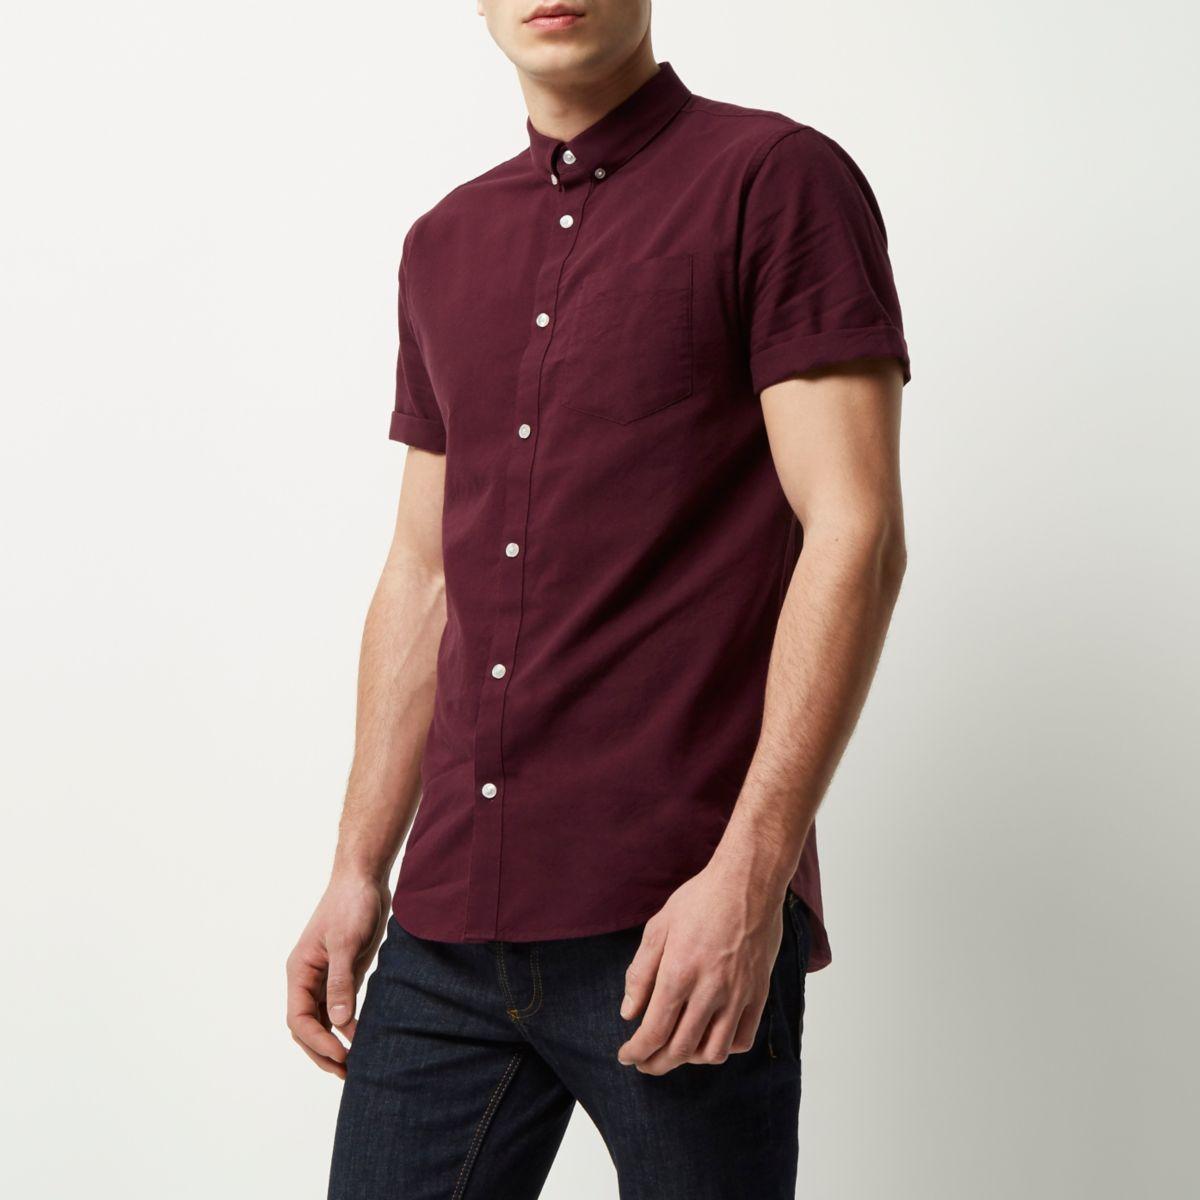 Bordeauxrood Oxford overhemd met korte mouwen